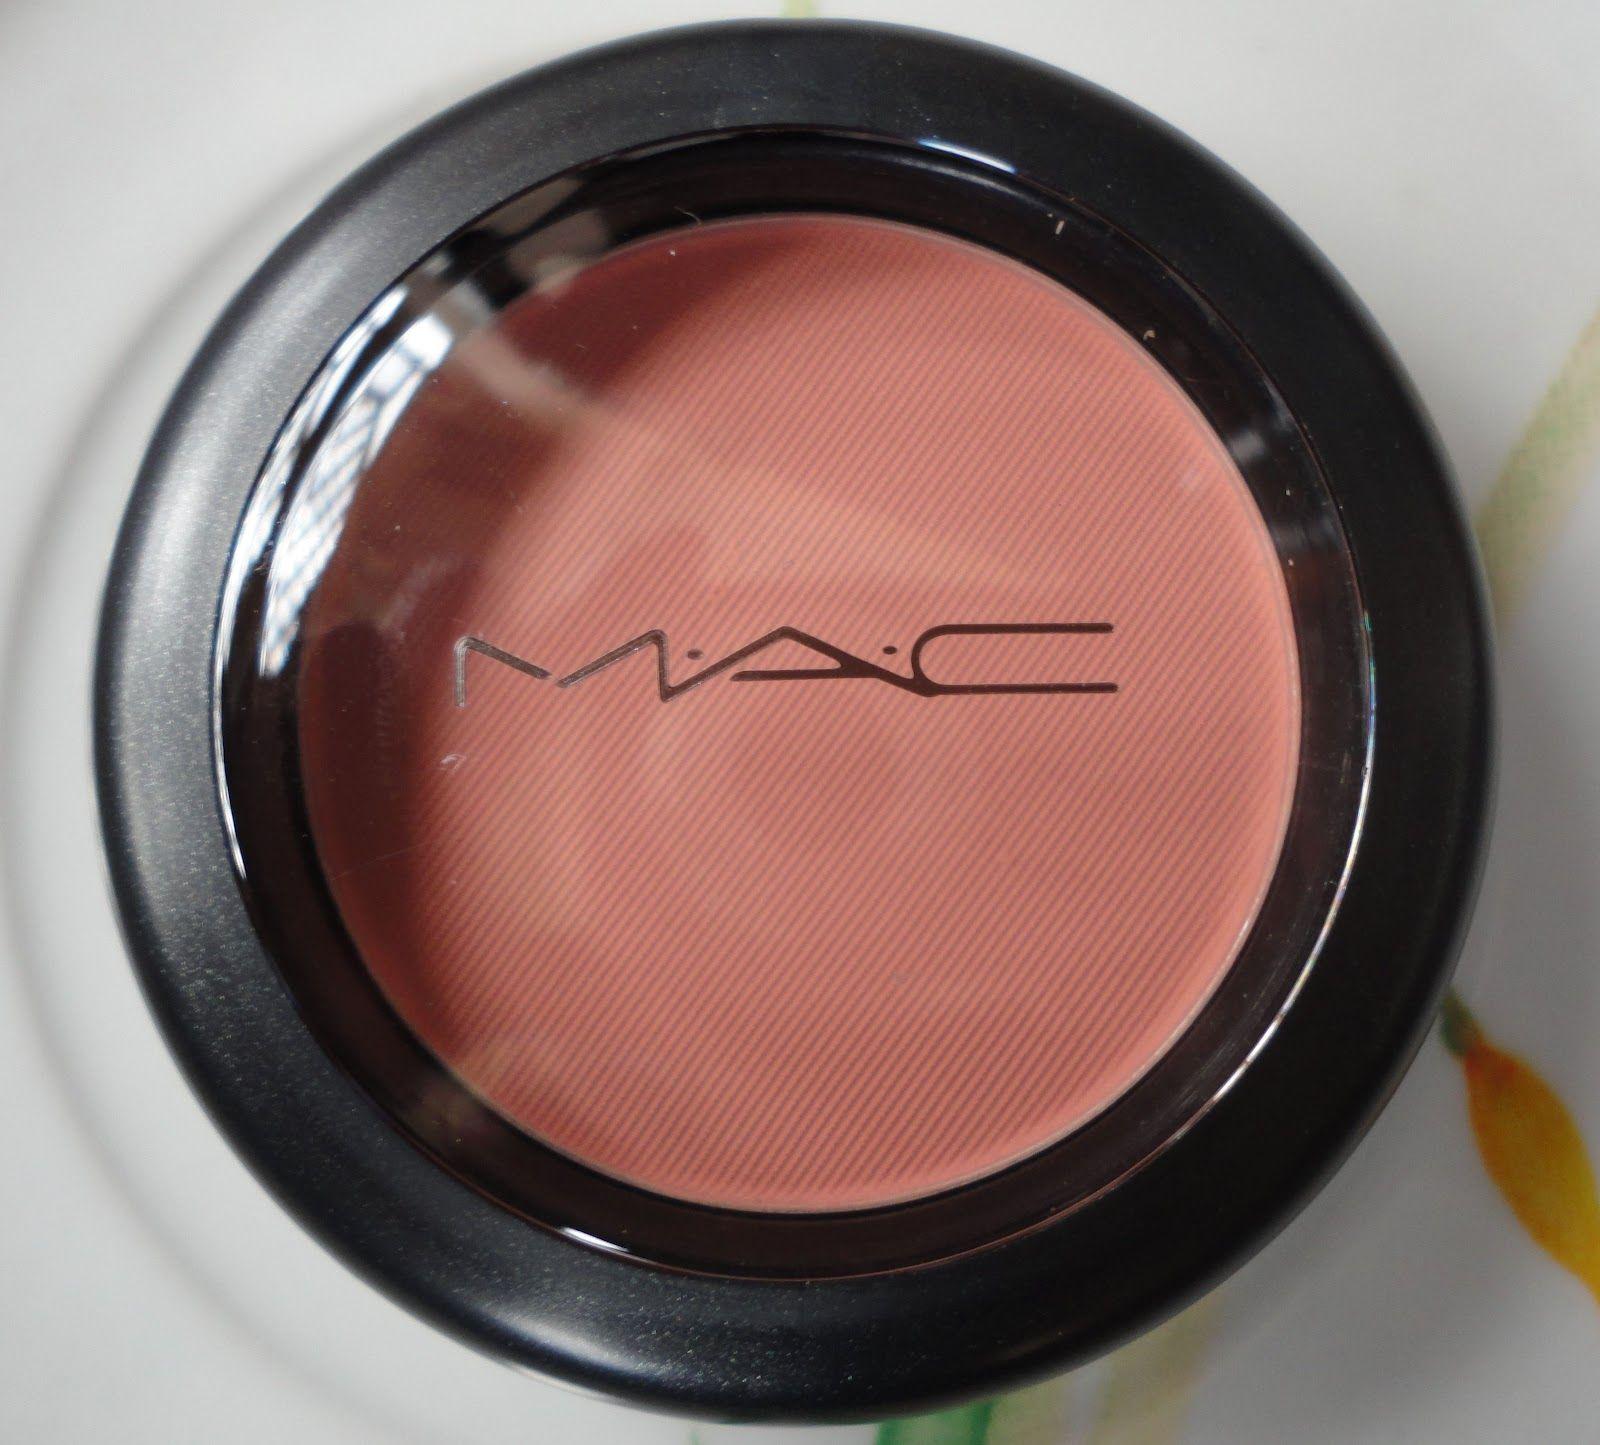 Top MAC Melba Blush all matte rosey peach looks good on everyone  MH56